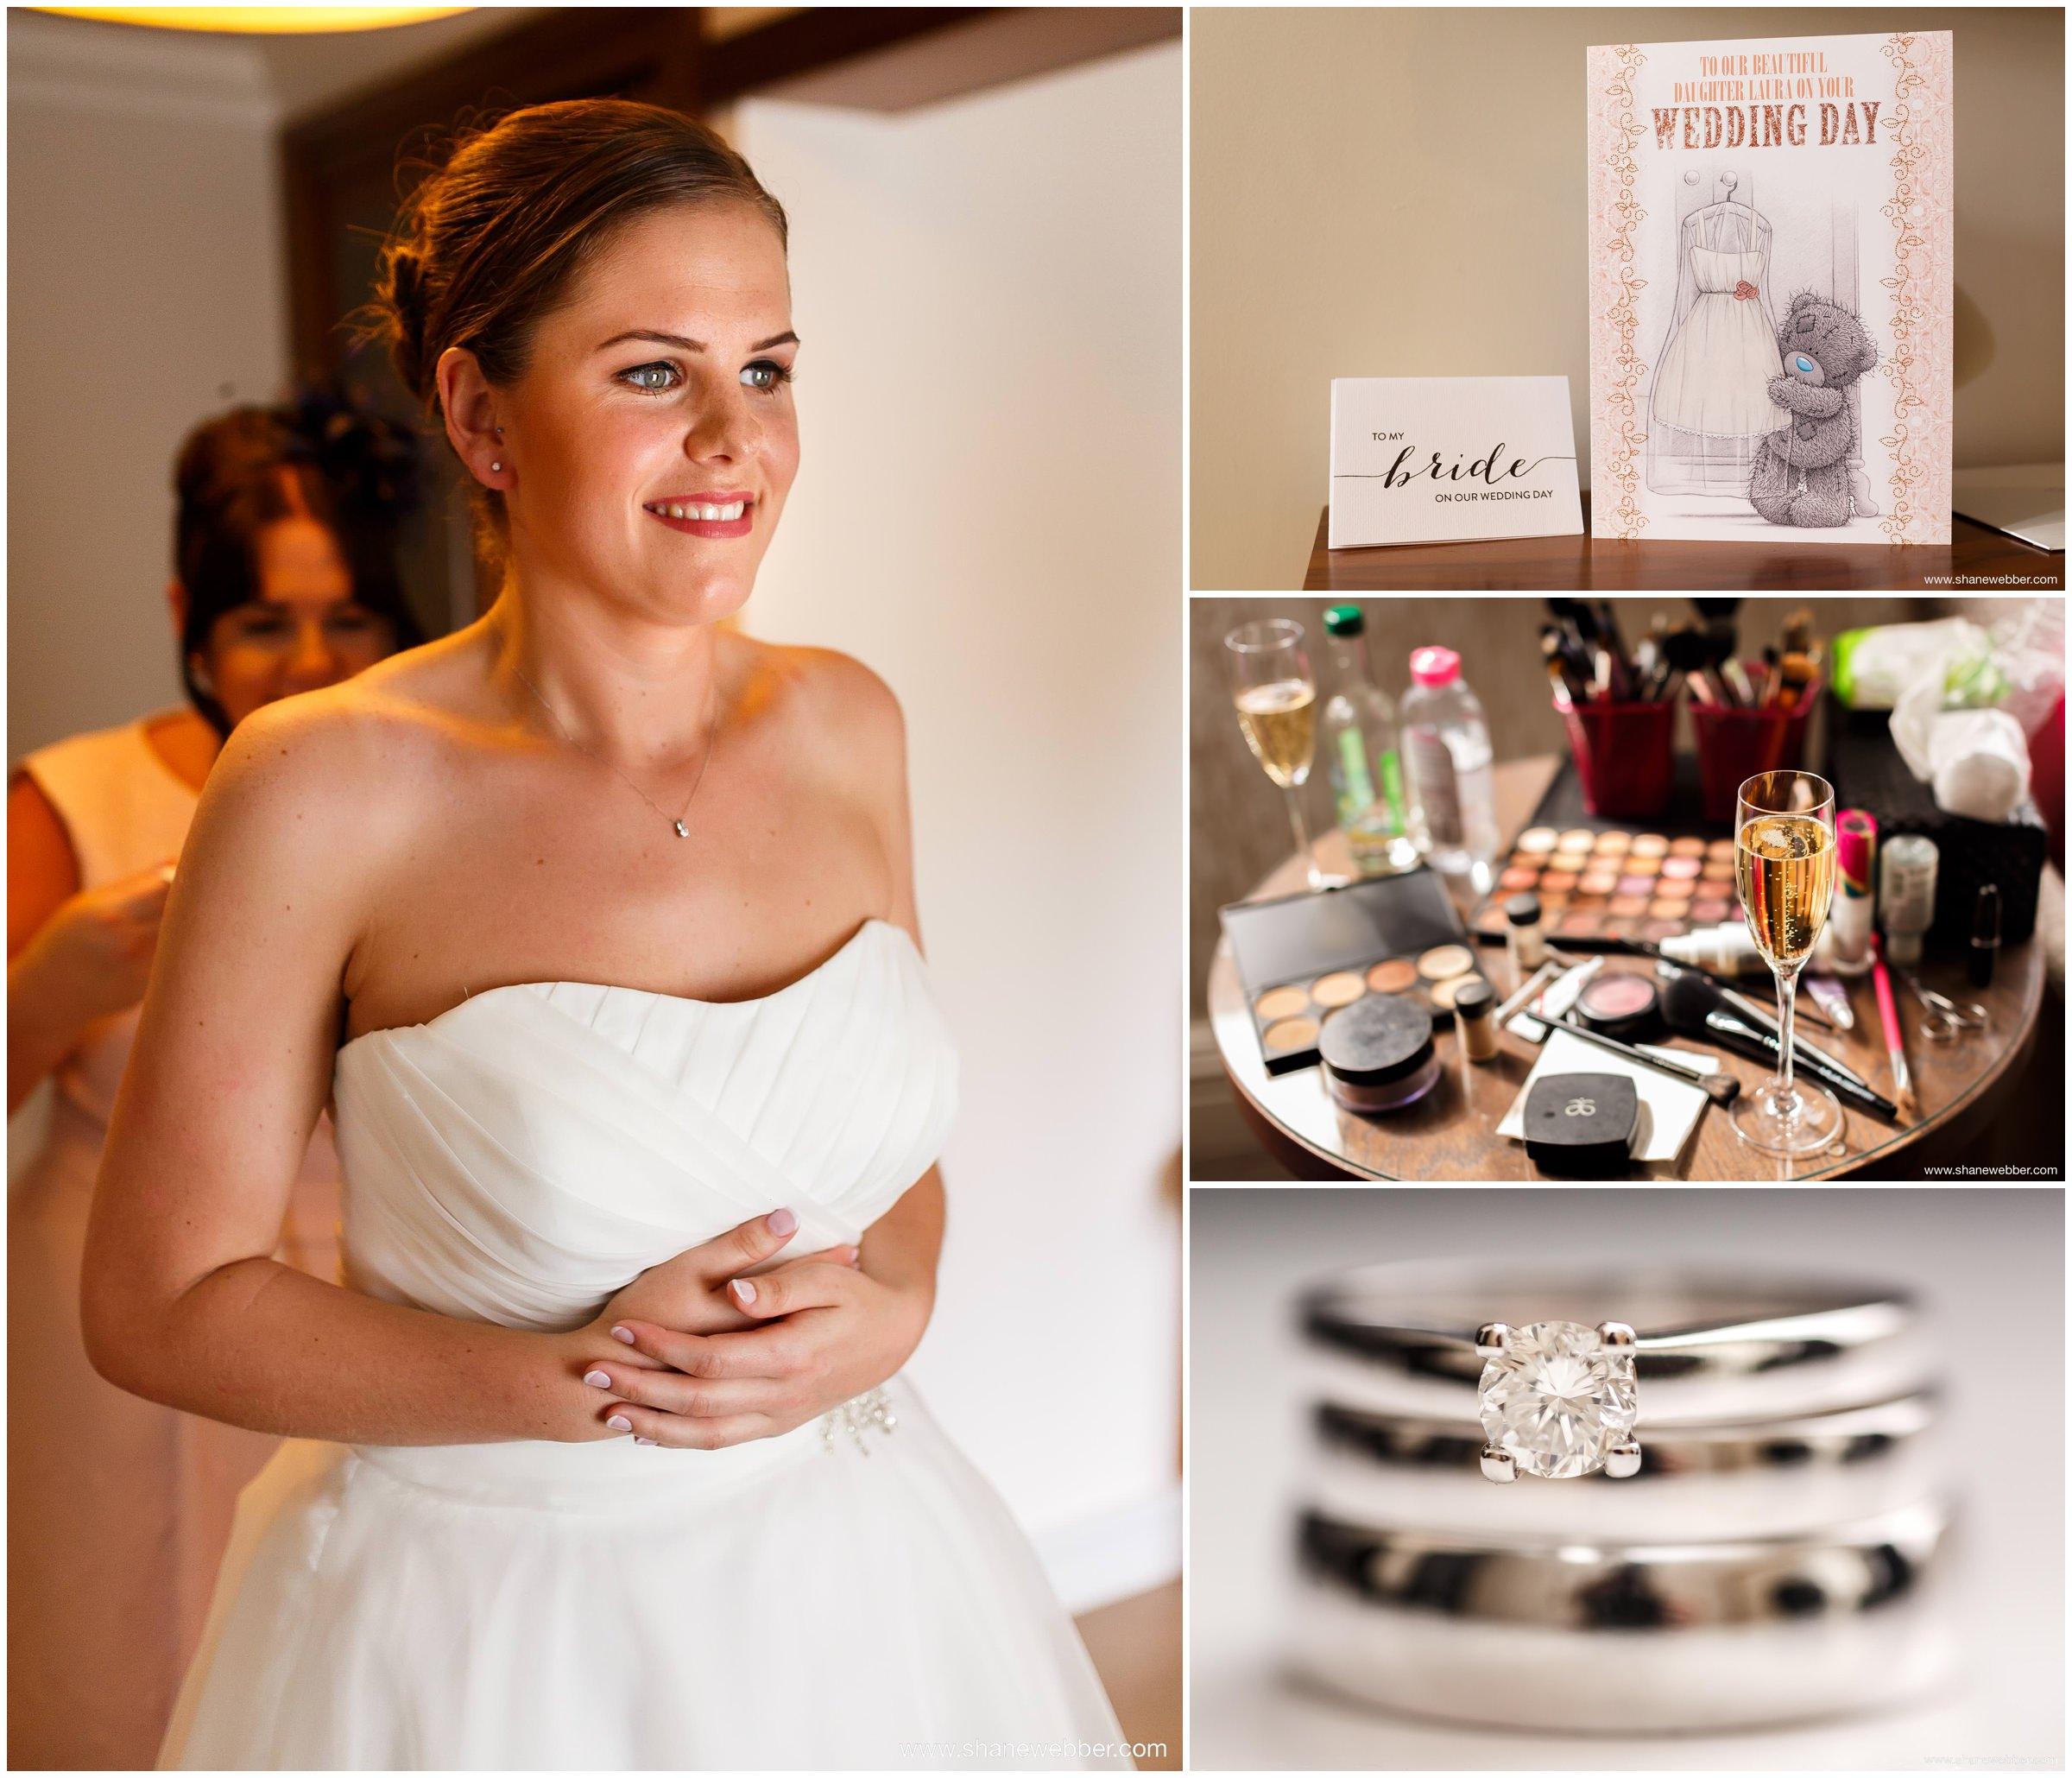 Bridal preparation photos at the Grosvenor Hotel Pulford